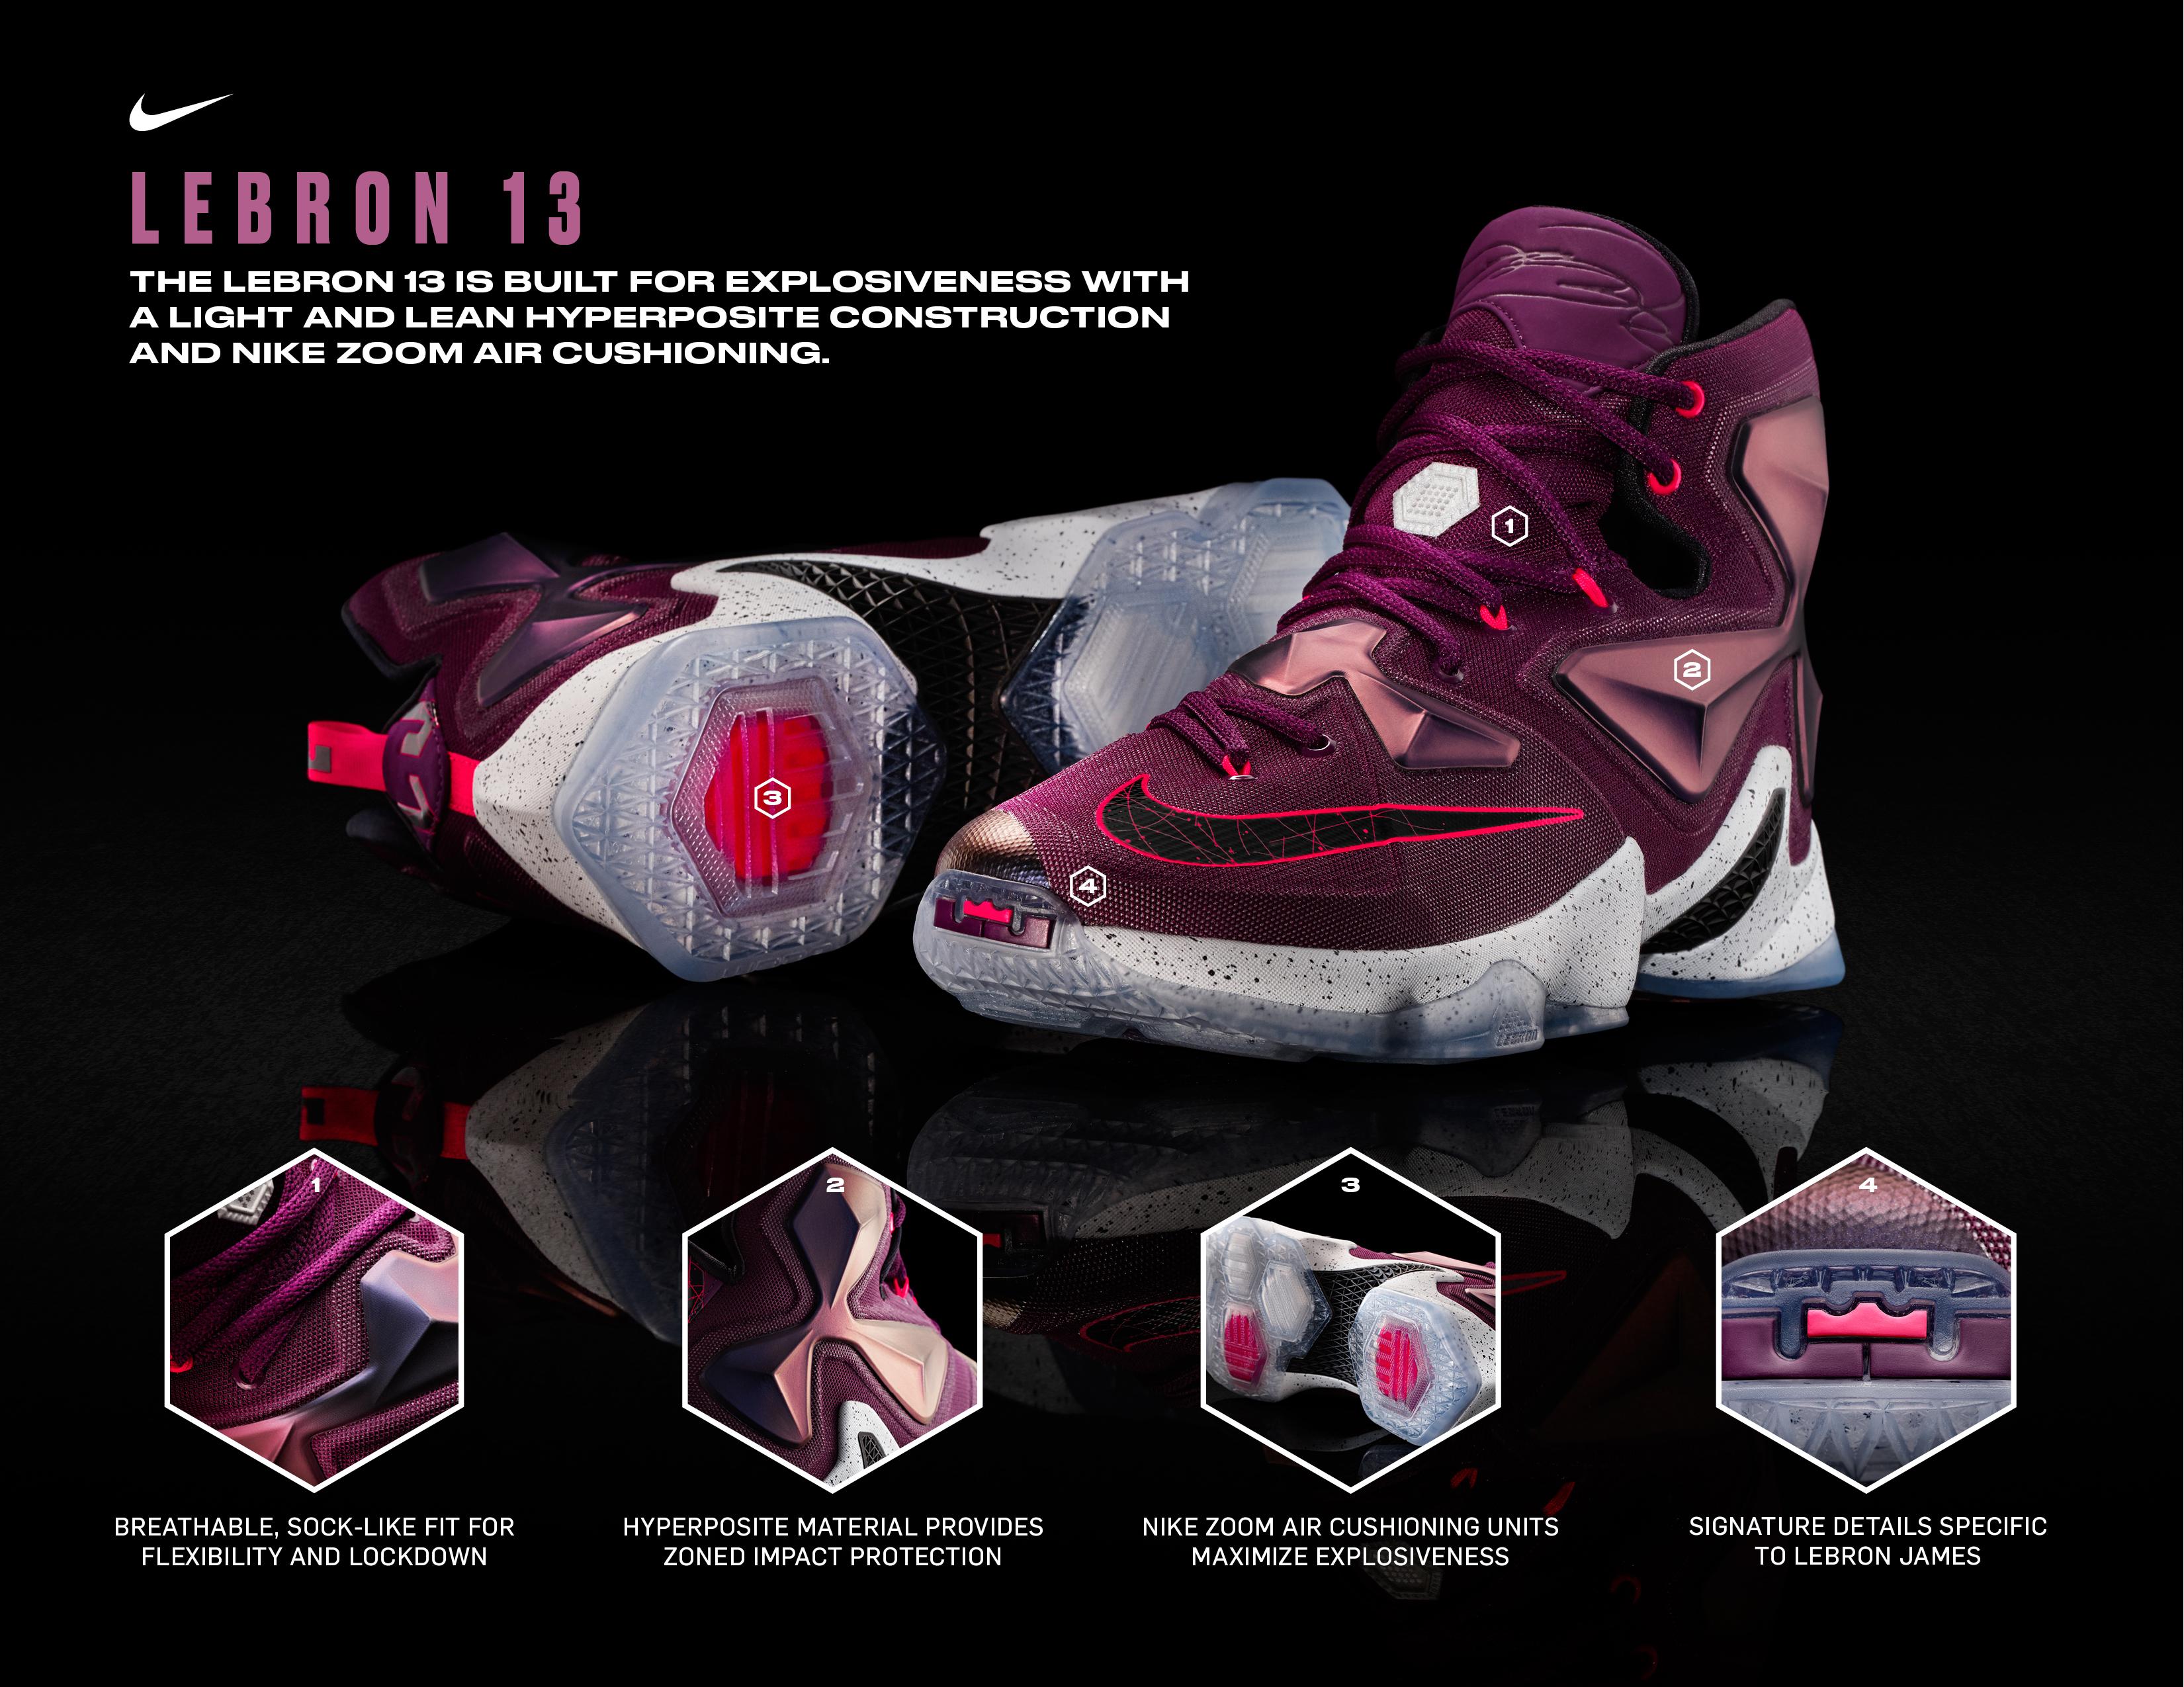 Nike Lebron 13 Shoes